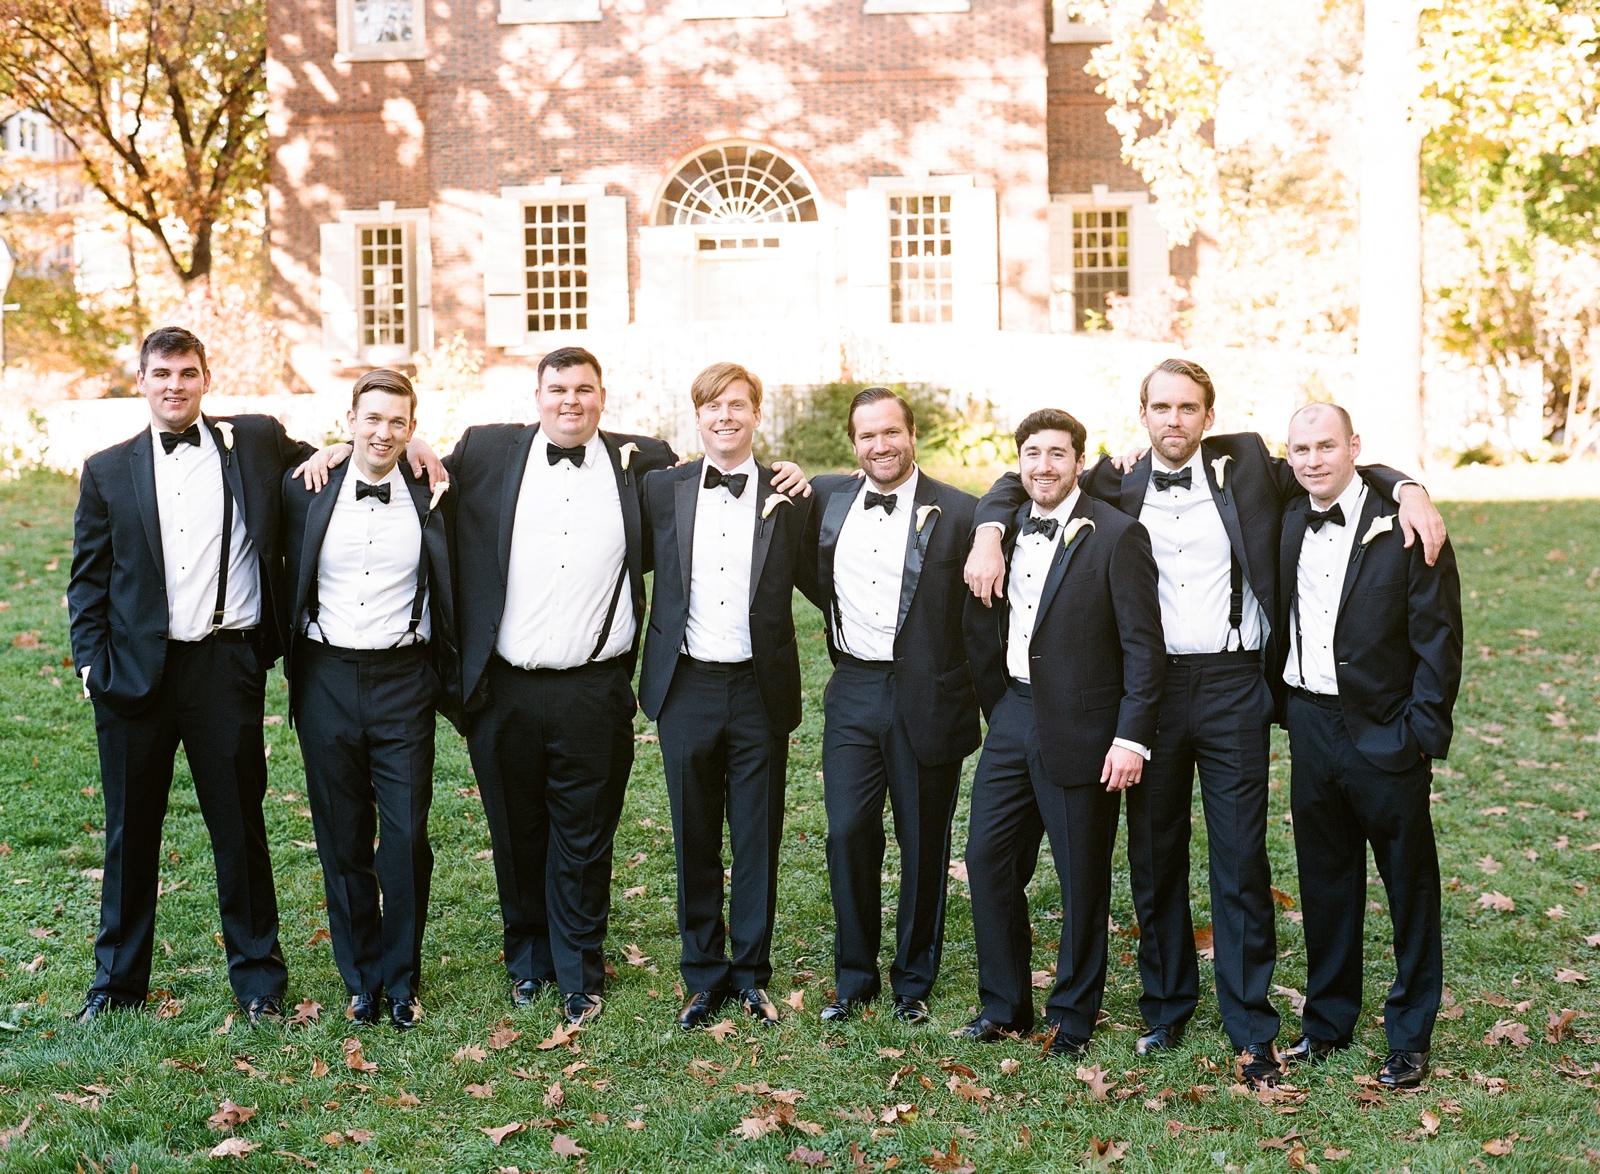 atrium at curtis center wedding photographer philadelphia wedding photographer shannon griffin_0018.jpg